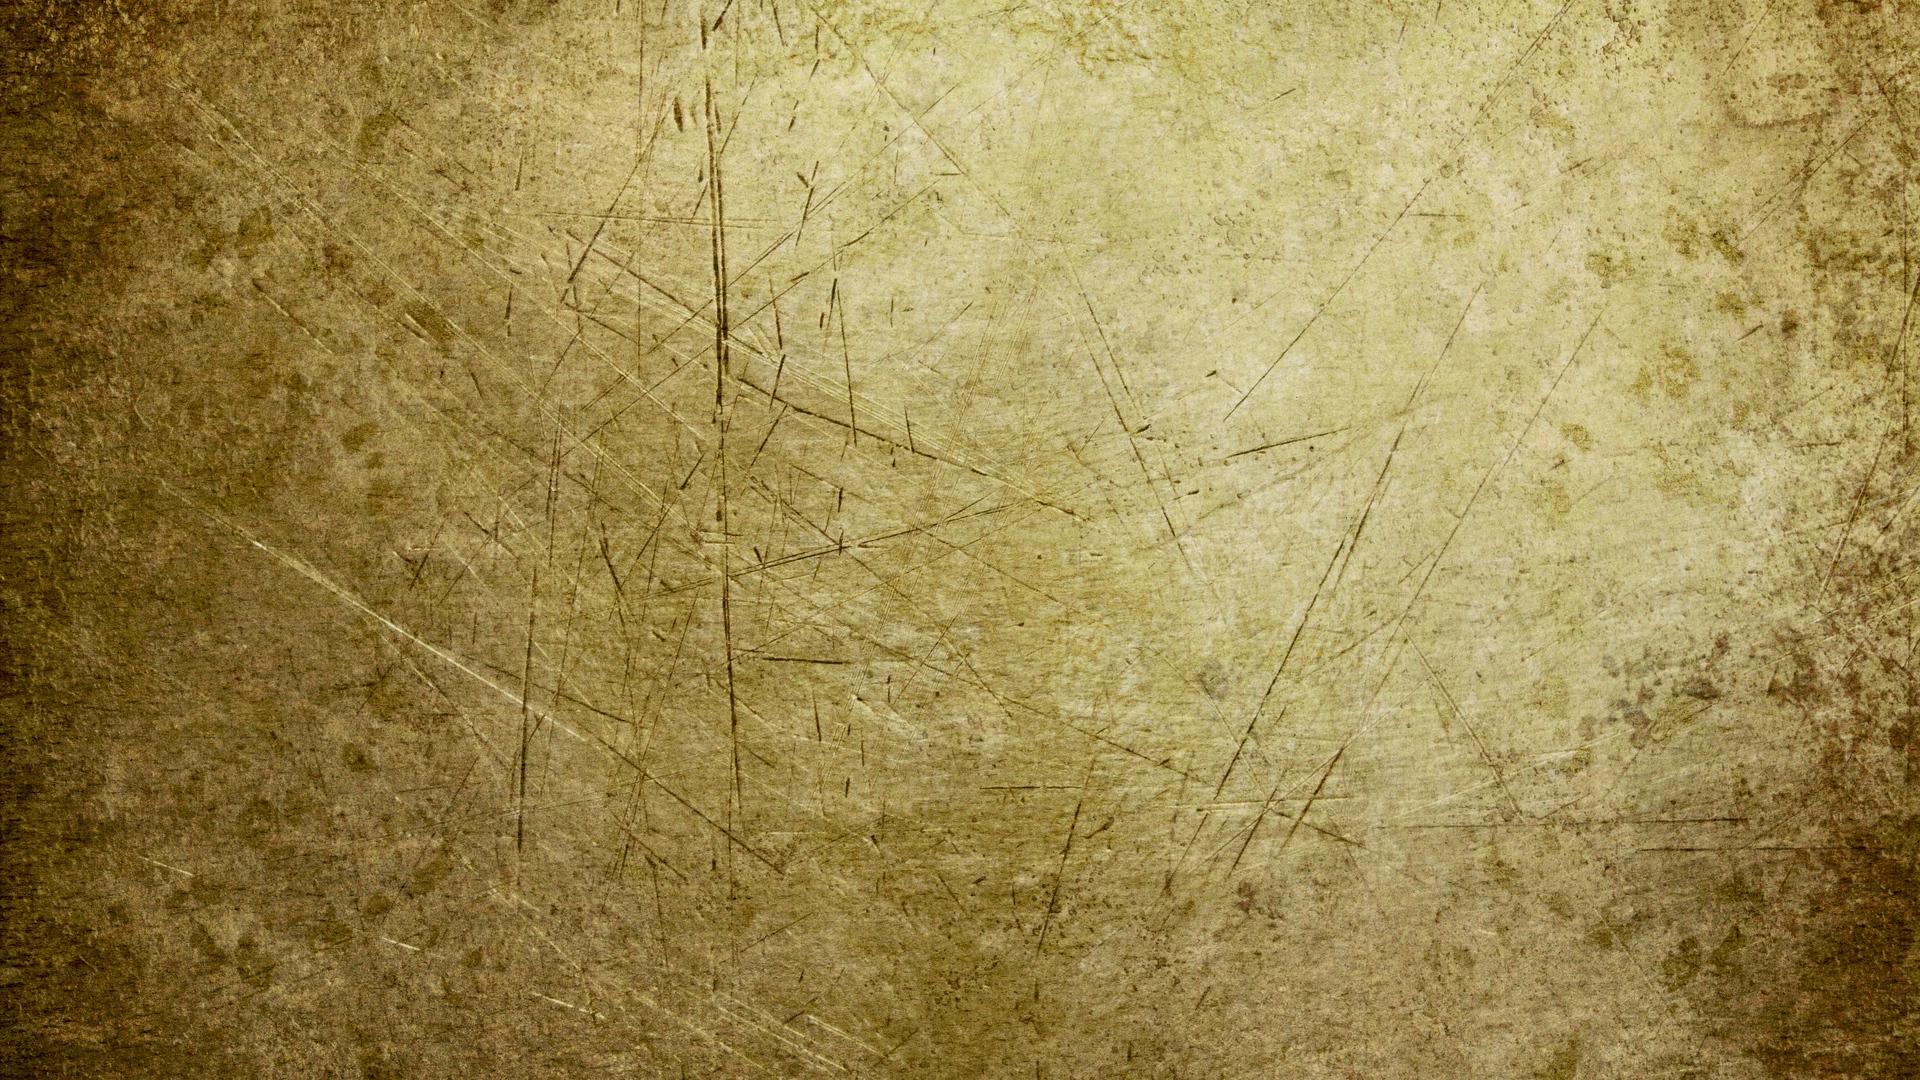 Download wallpaper 1920x1080 clipart, texture, wall full hd.